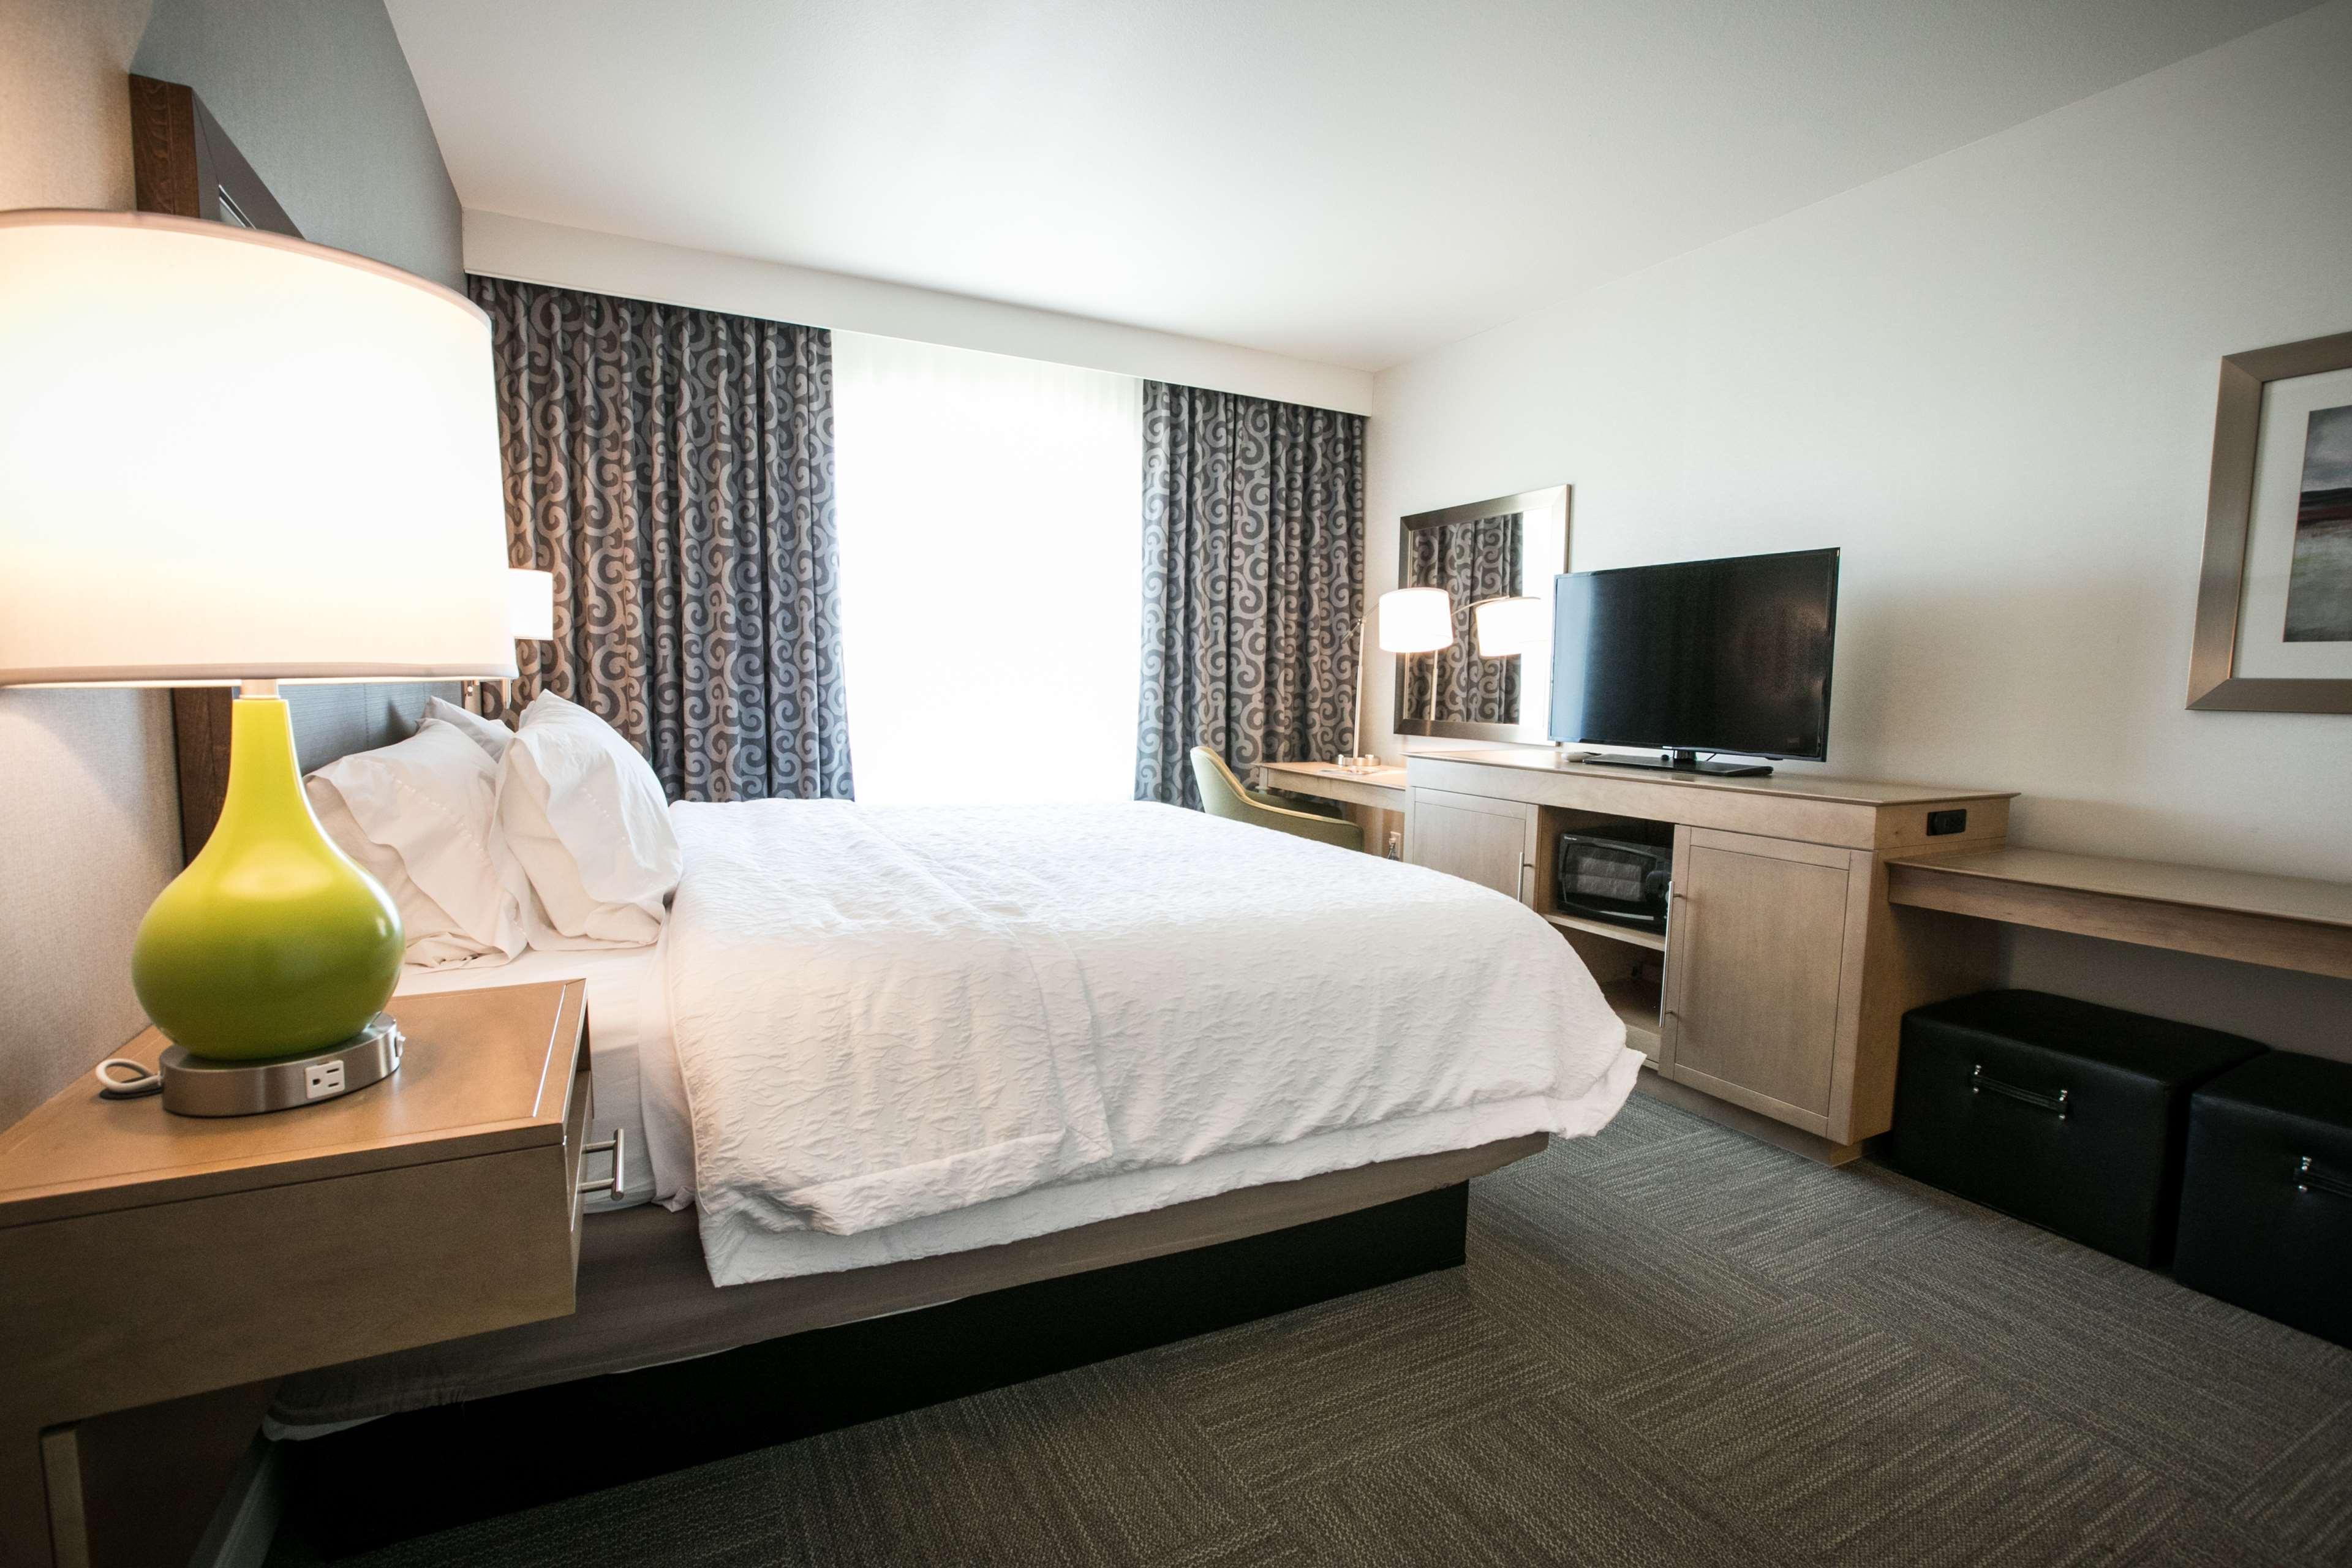 Hampton Inn & Suites Tempe - Phoenix Airport image 41